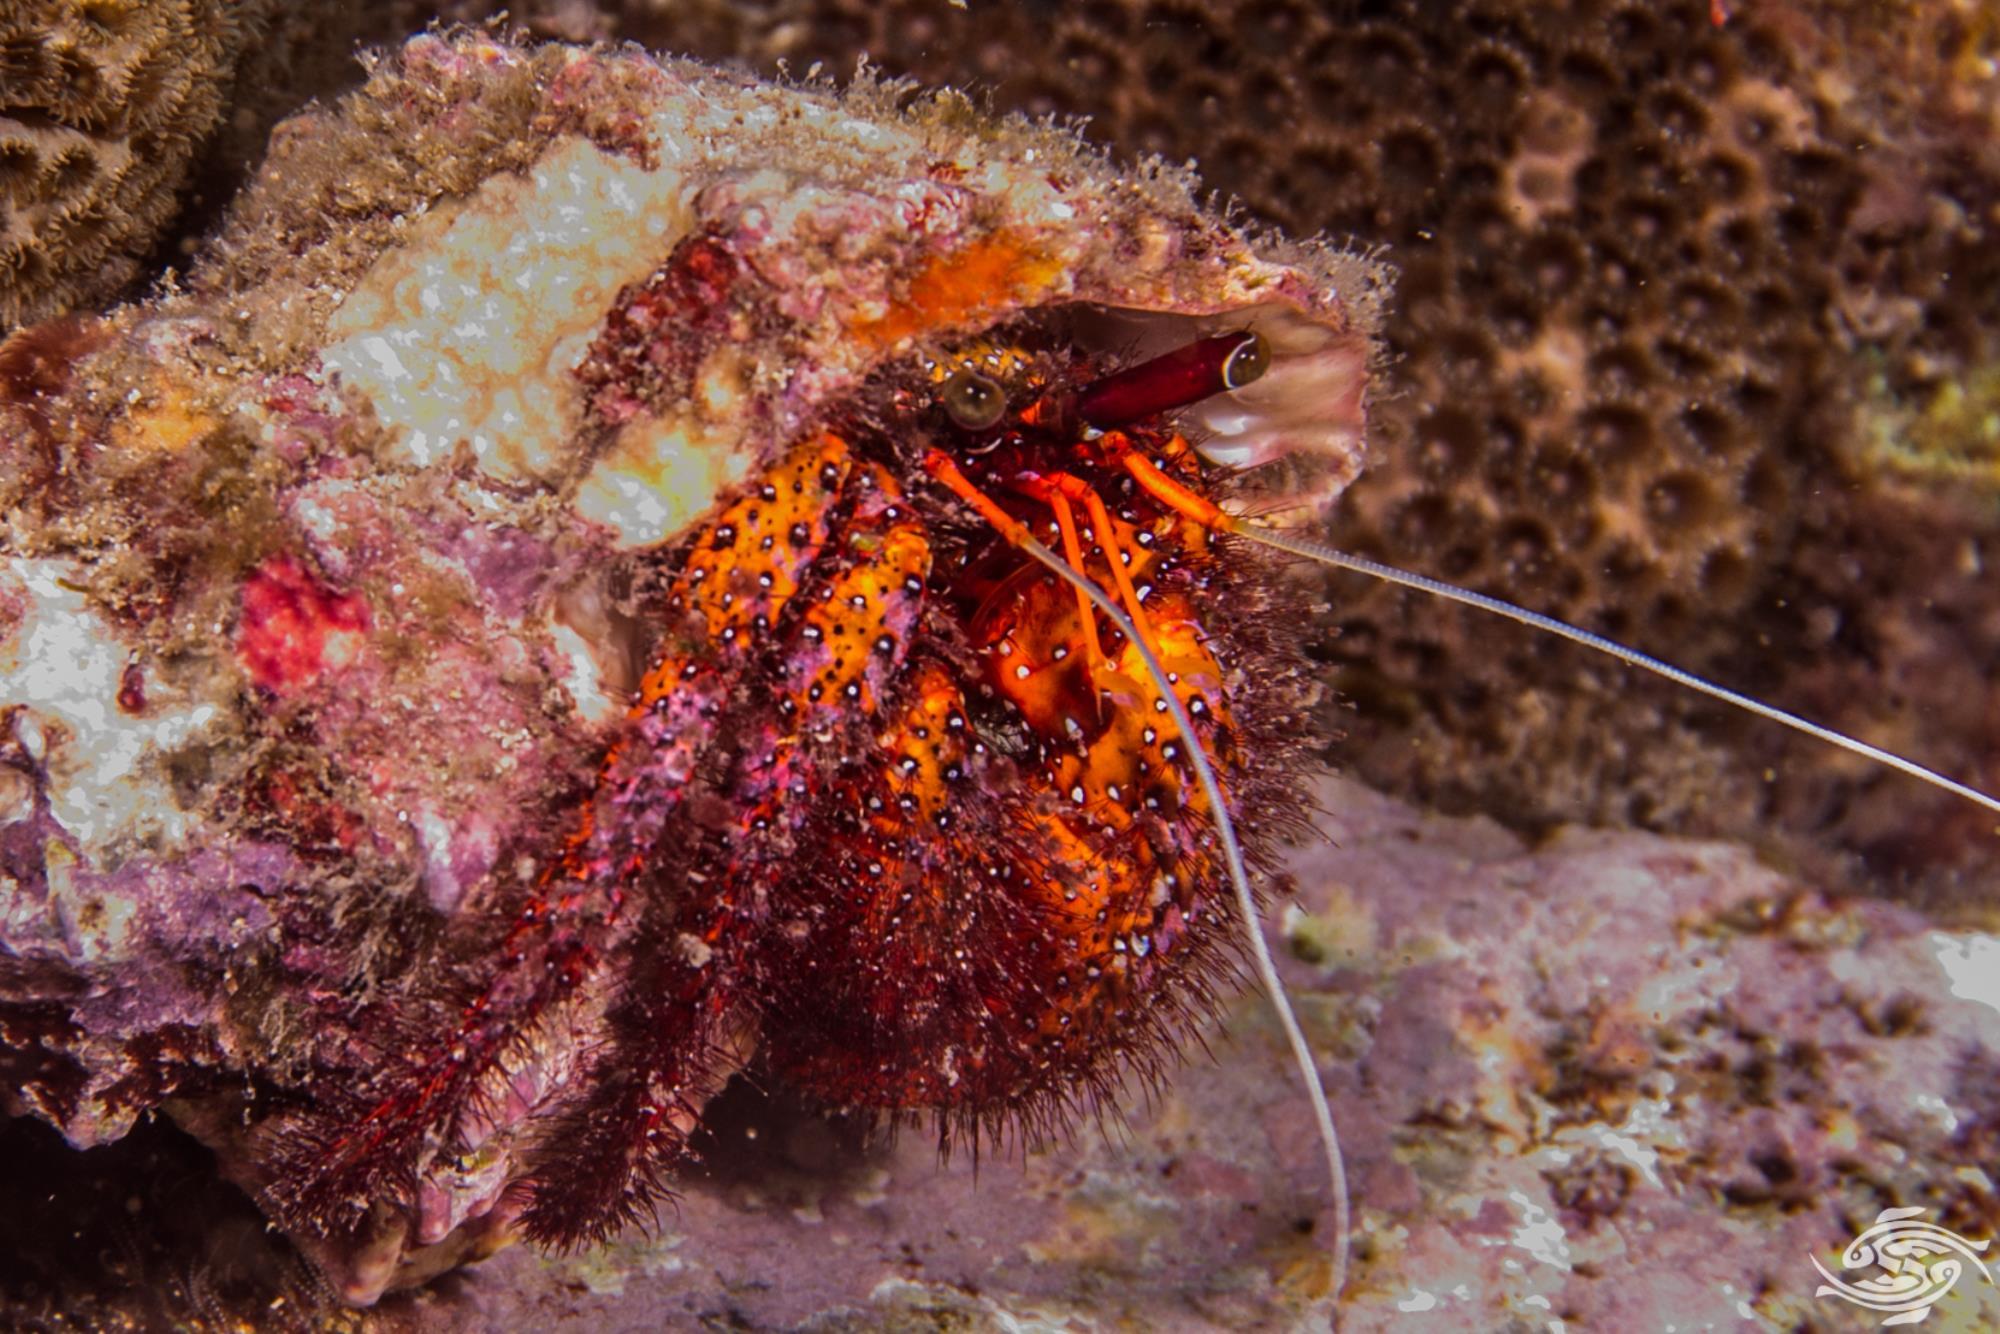 Dardanus megistos Common Name: Giant spotted hermit crab